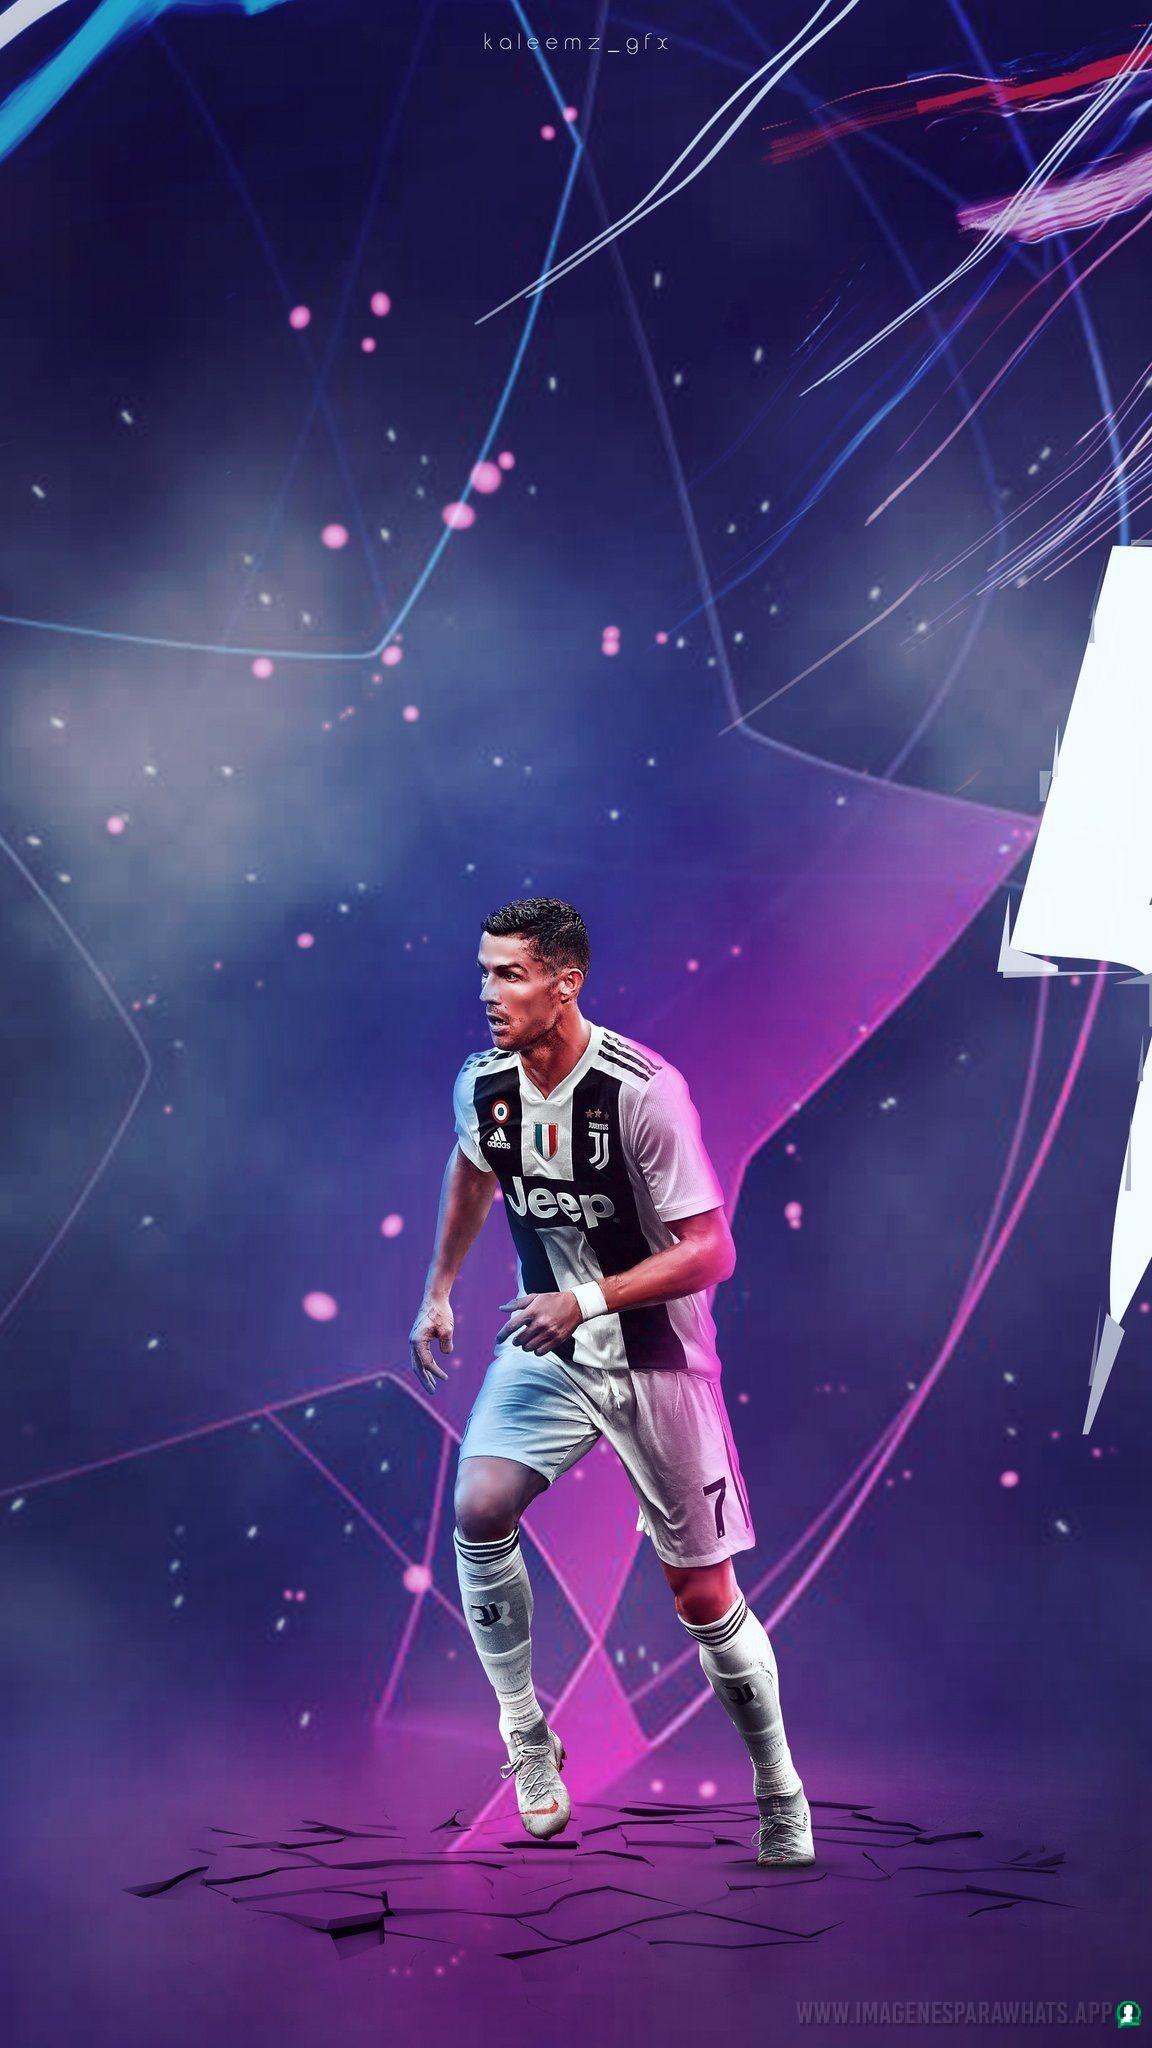 Imagenes de Futbol (1201)